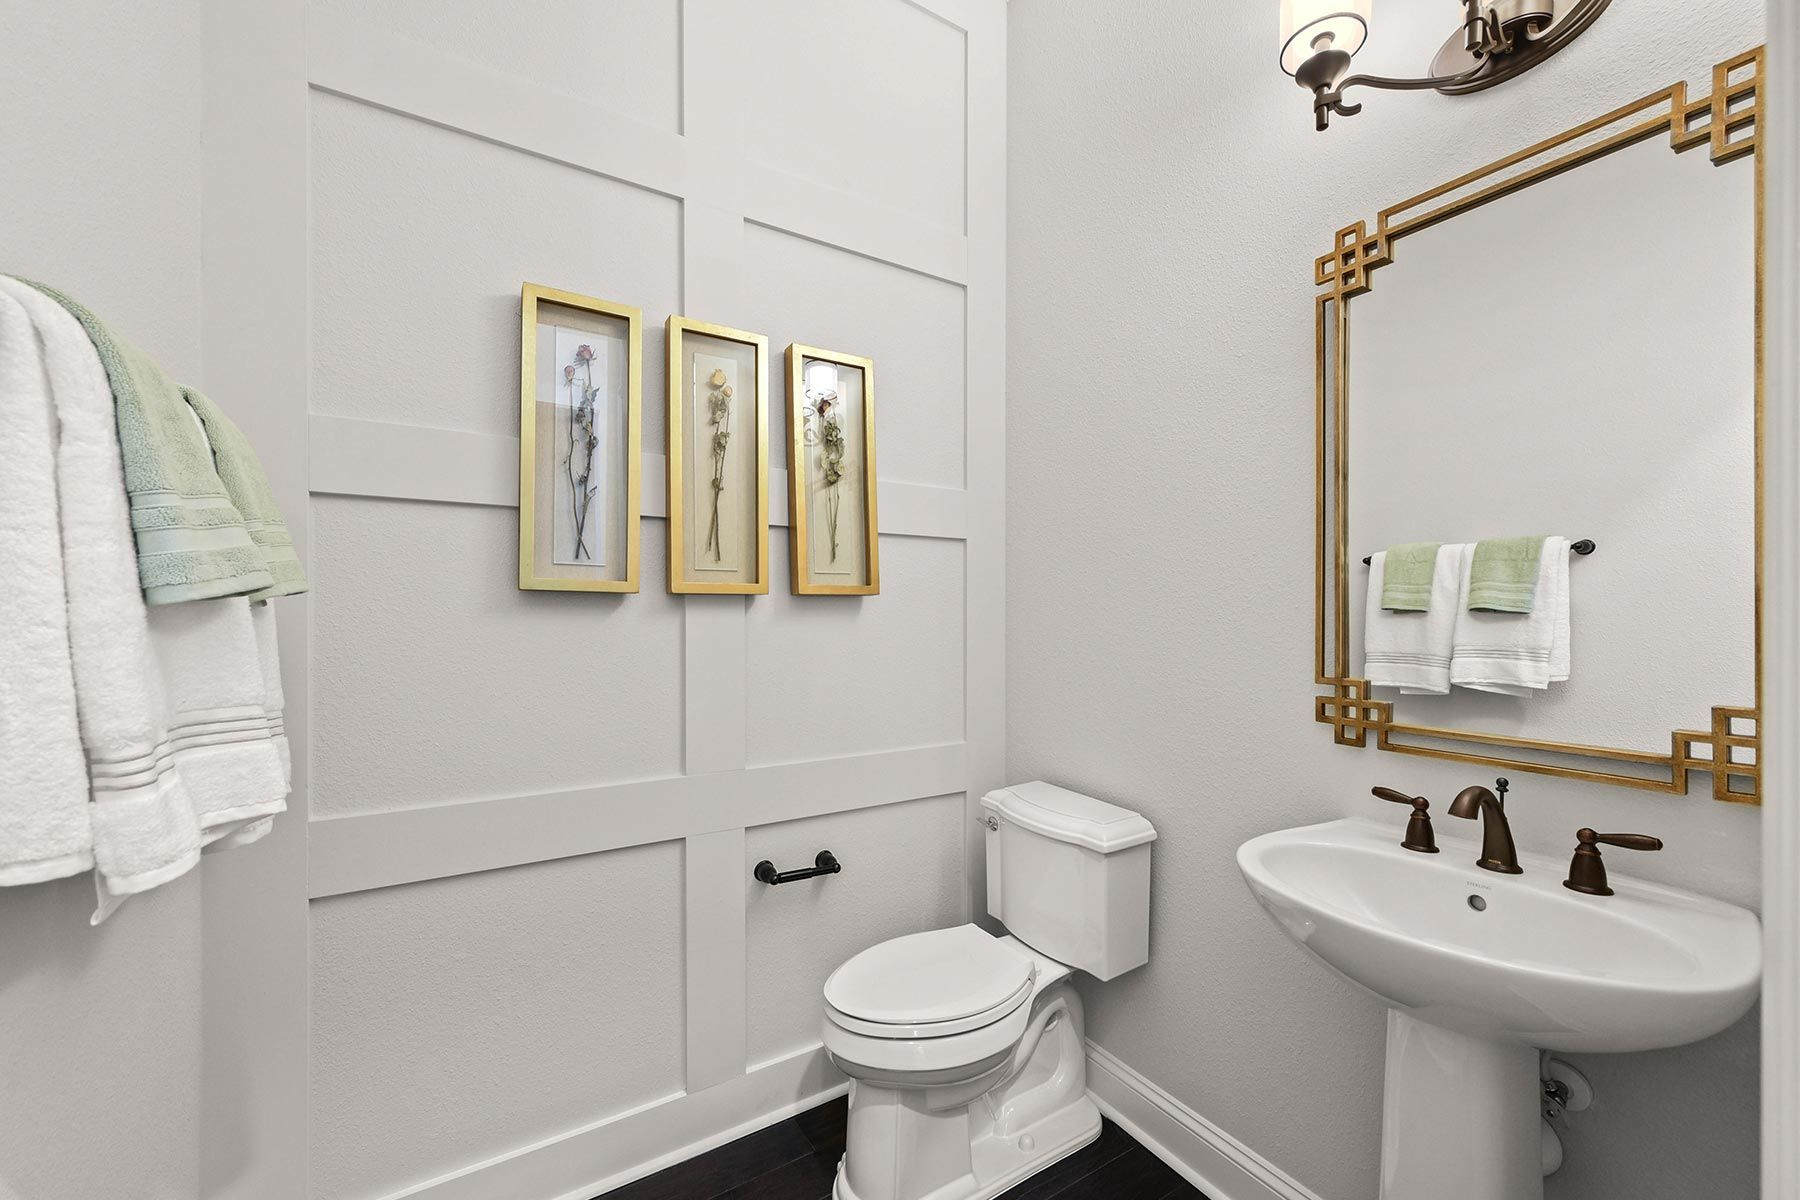 Bathroom featured in the Bridge By Mattamy Homes in Jacksonville-St. Augustine, FL